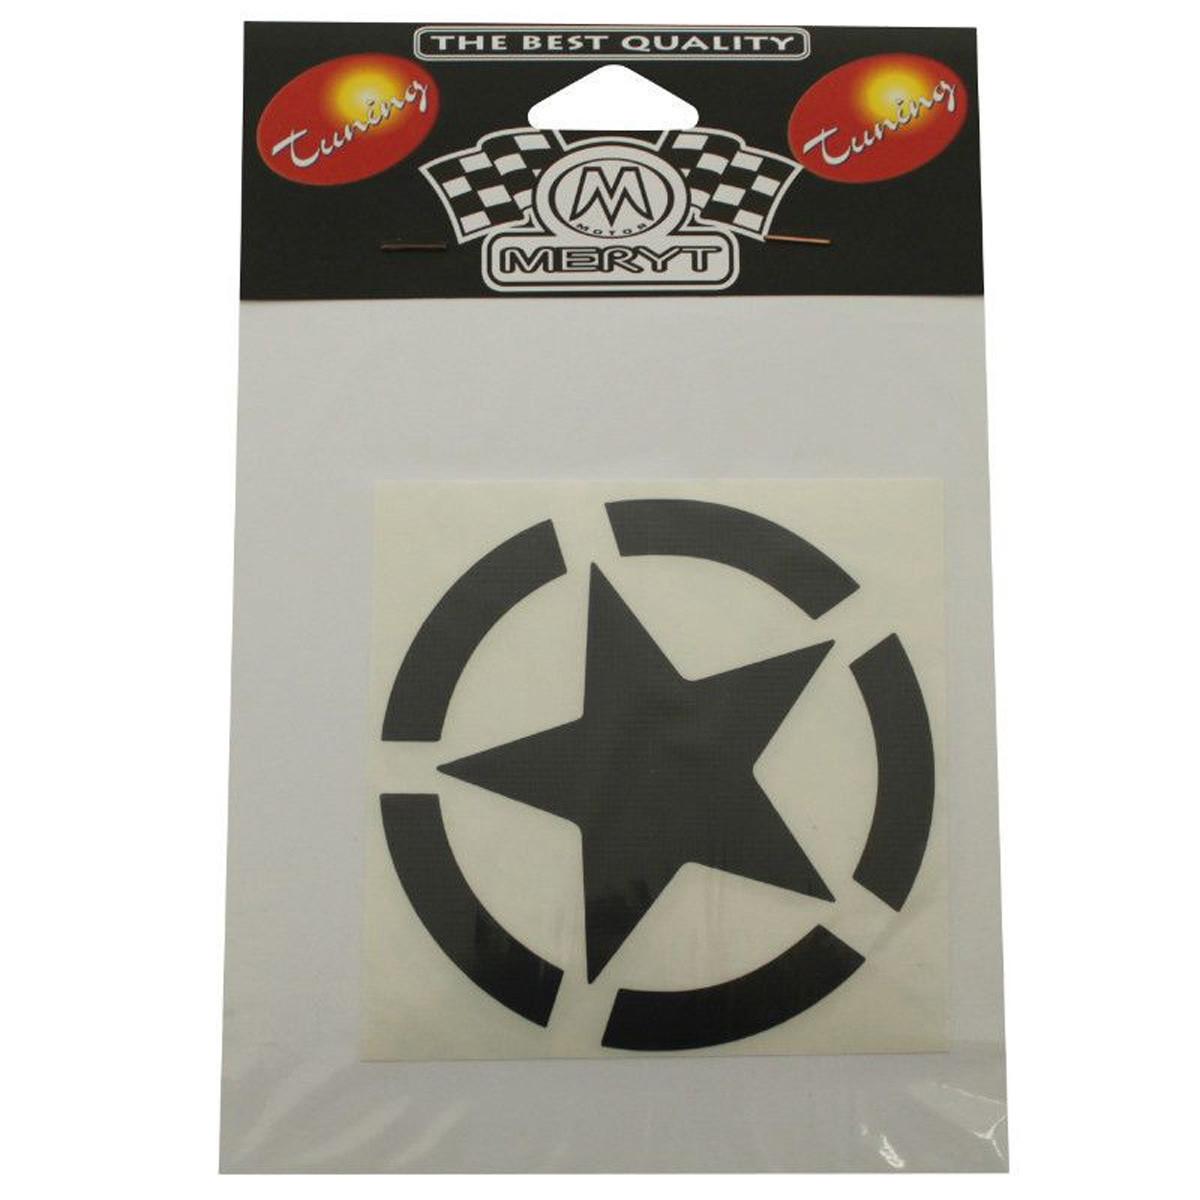 Autocollant / Sticker - MERYT Etoile Noir 10cm